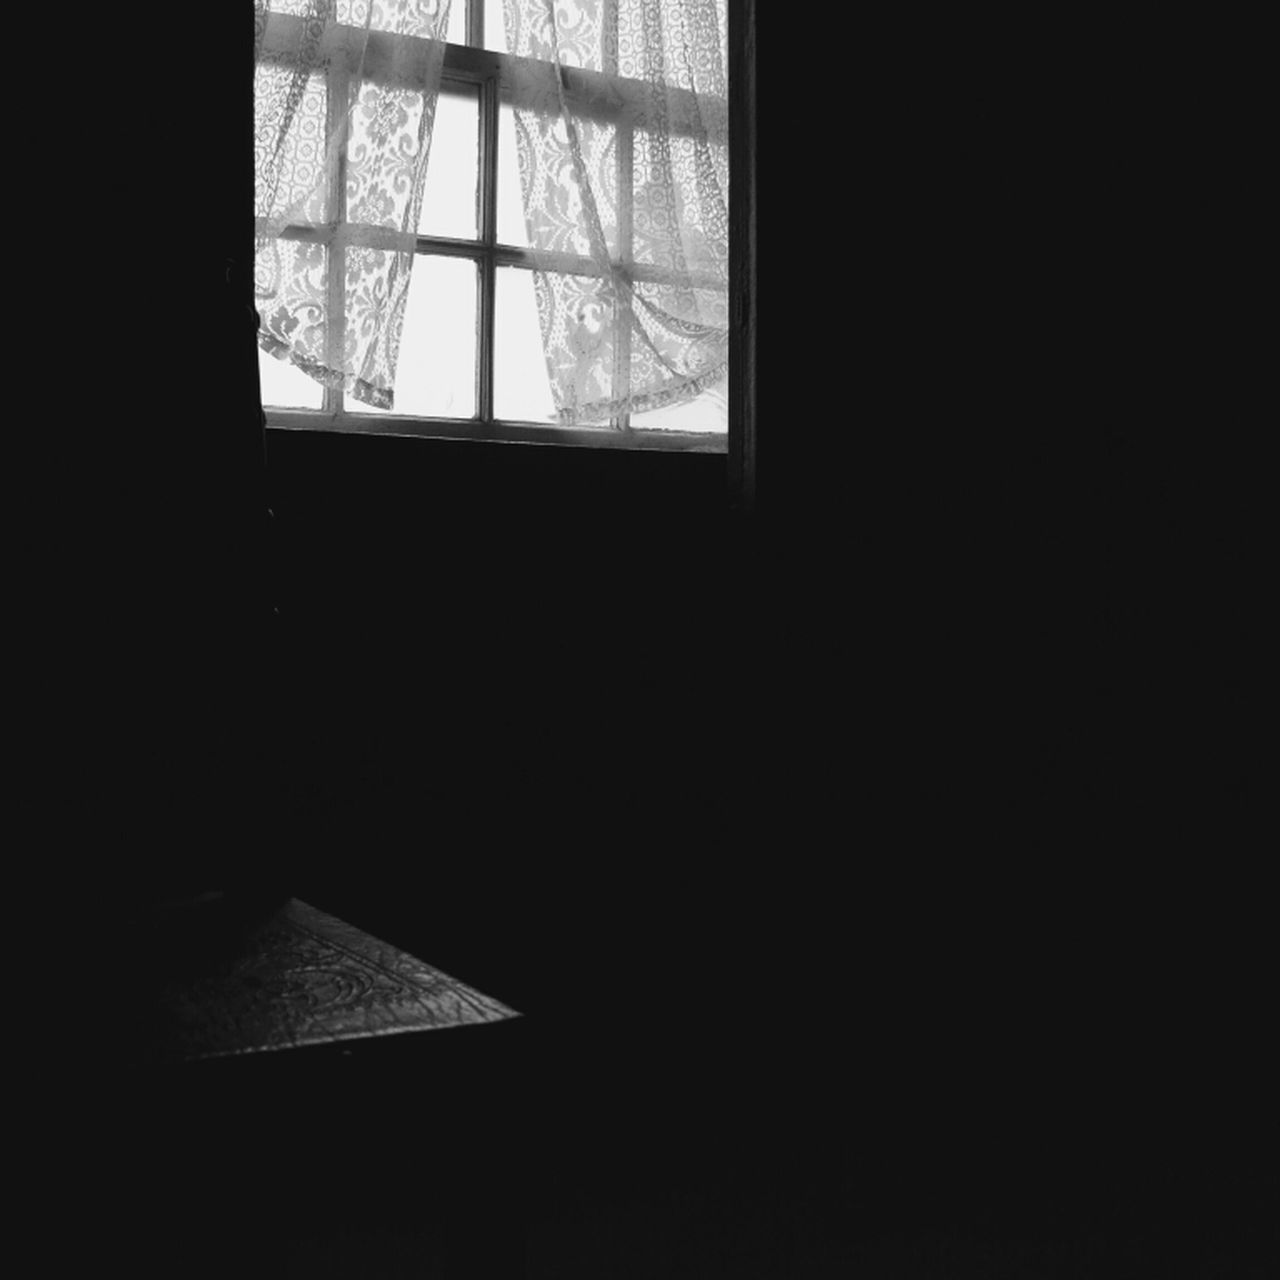 VIEW OF WINDOWS